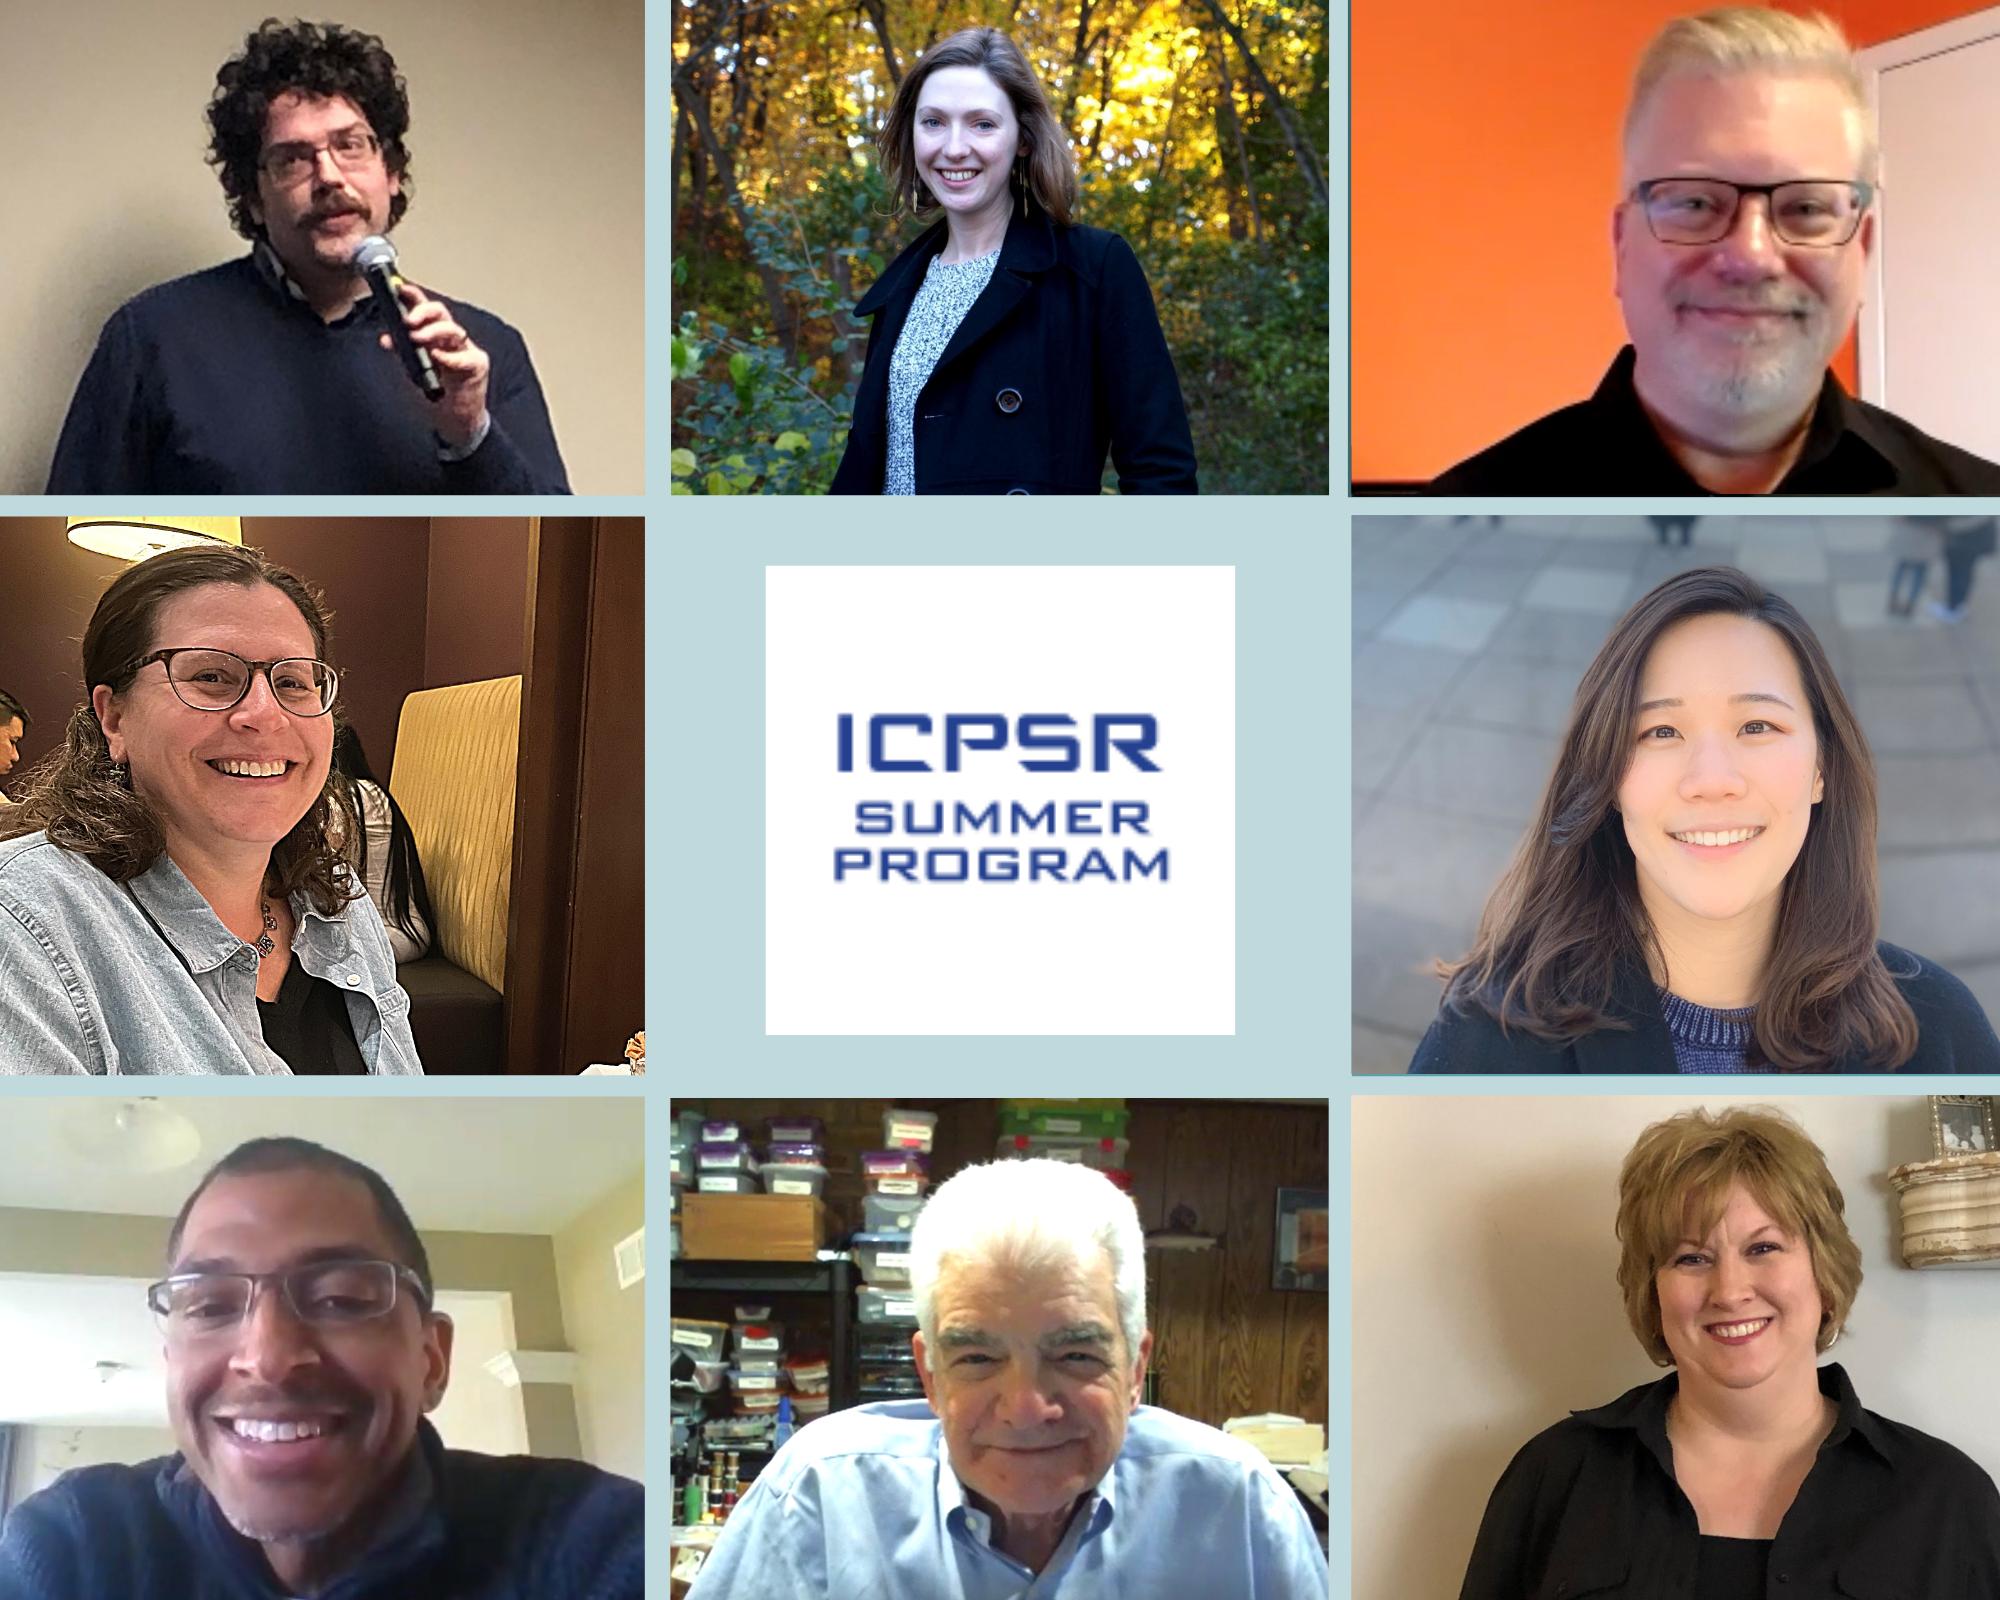 ICPSR Summer Program Staff photo